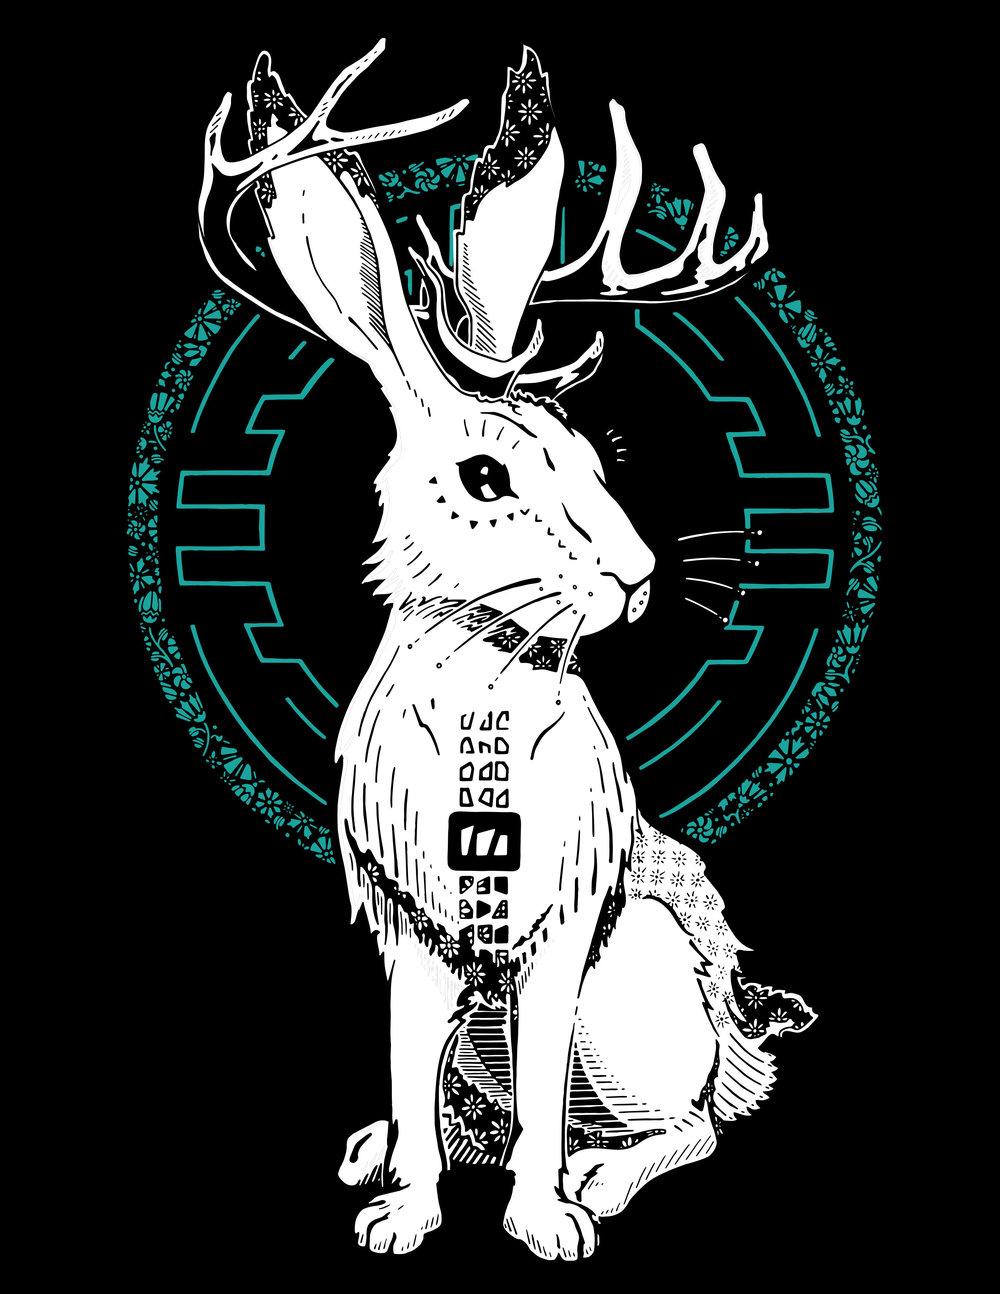 MoveTru Jackalope T-shirt - Won by: Kelsey